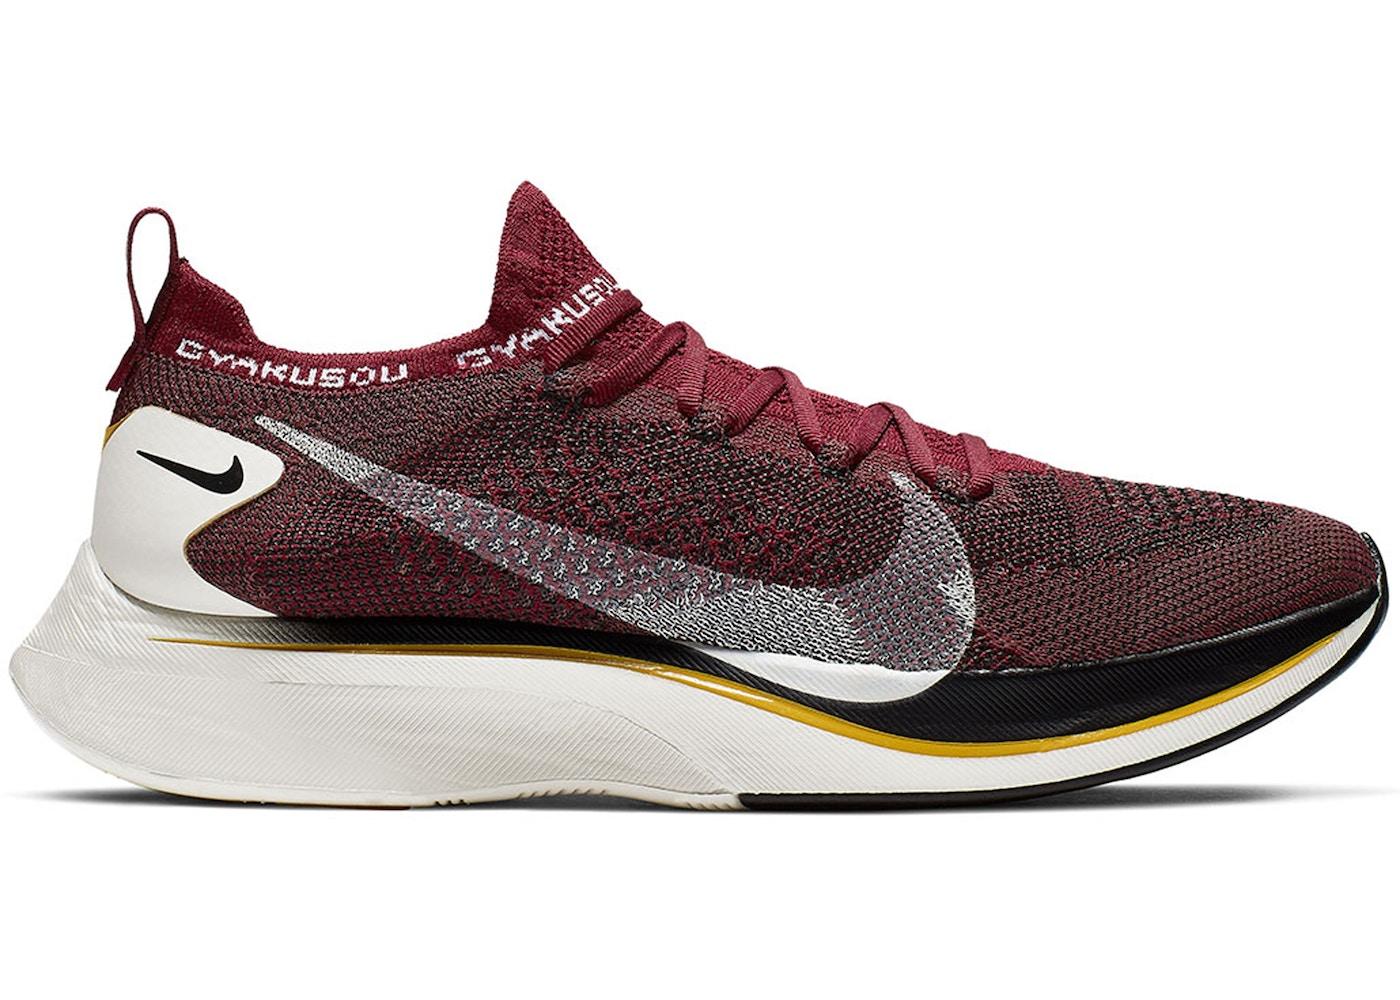 Nike VaporFly 4% Flyknit Gyakusou Team Red - AV7998-600 612b999ee